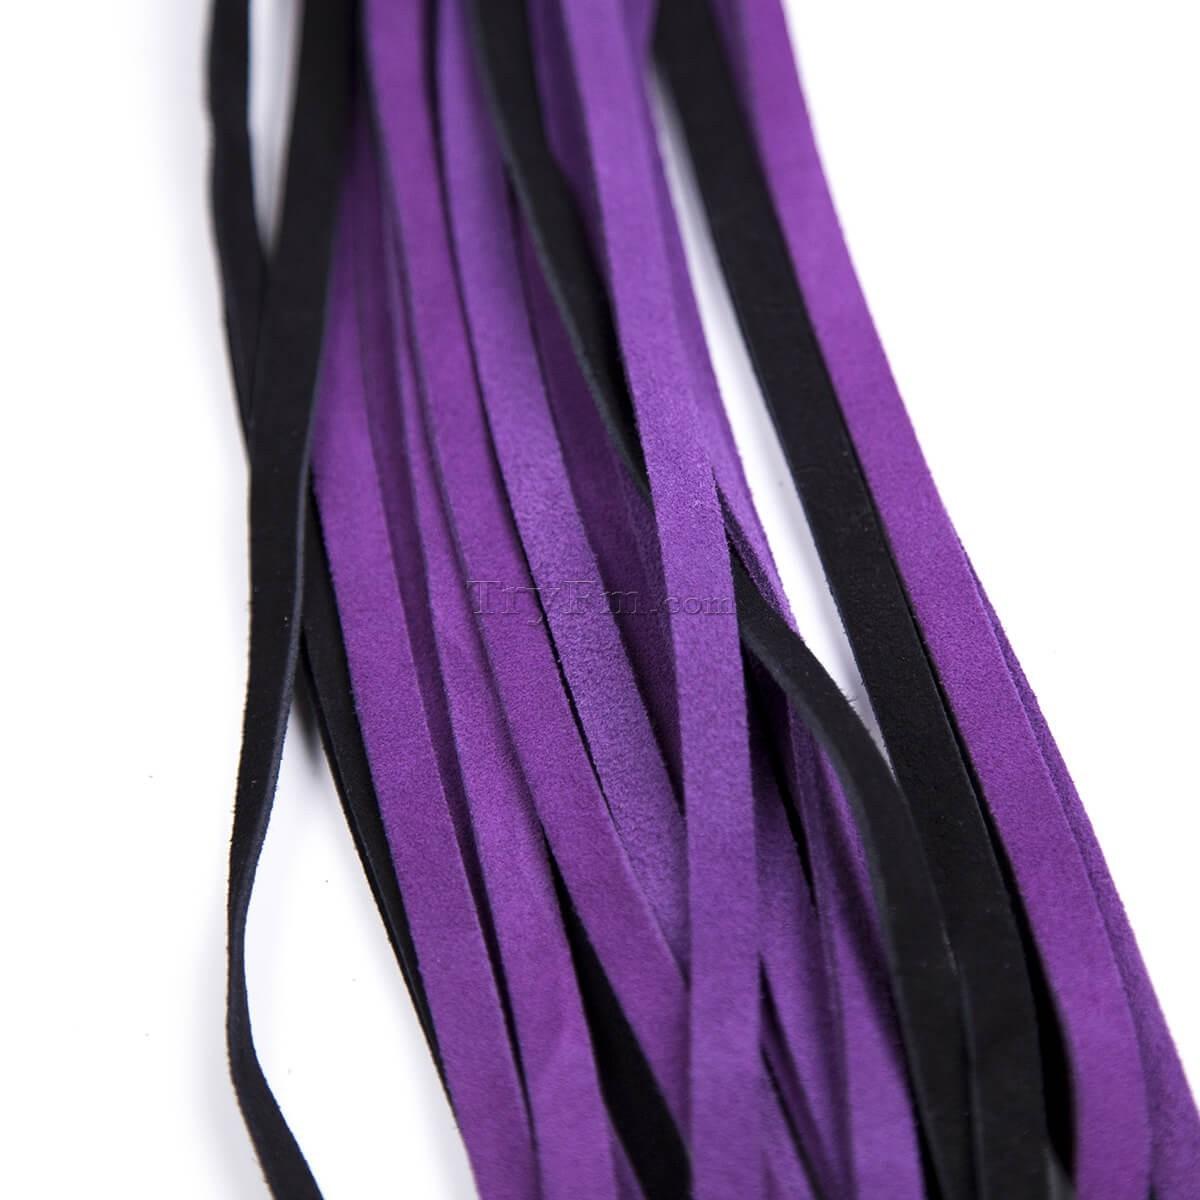 15-purple-spanking-toy3.jpg